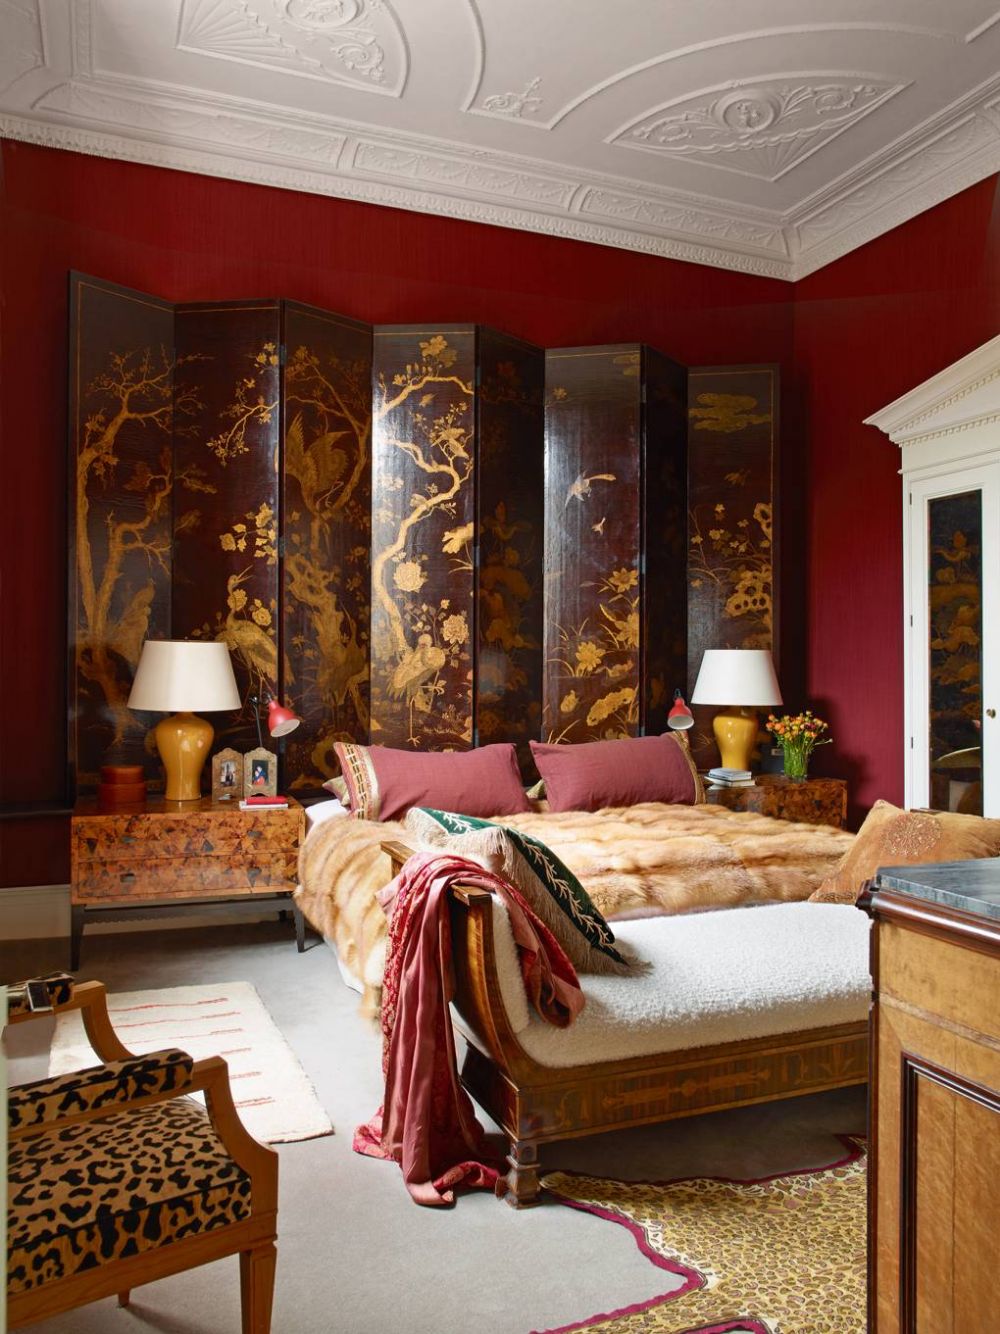 Douglas Mackie's deeply sophisticated Marylebone flat